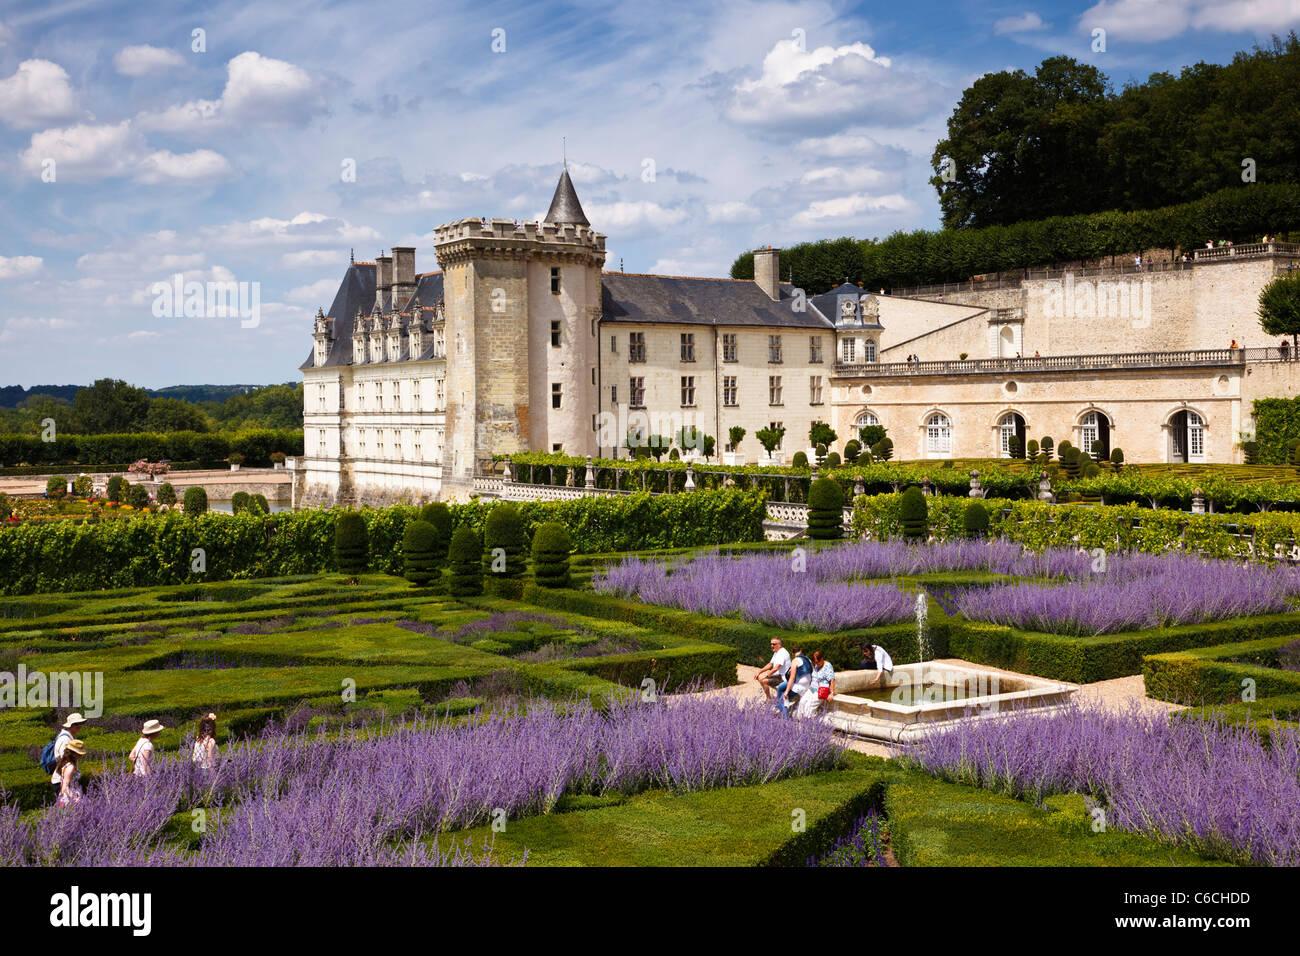 Loire Valley - Chateau de Villandry from the herb garden, Indre et Loire, France, Europe - Stock Image